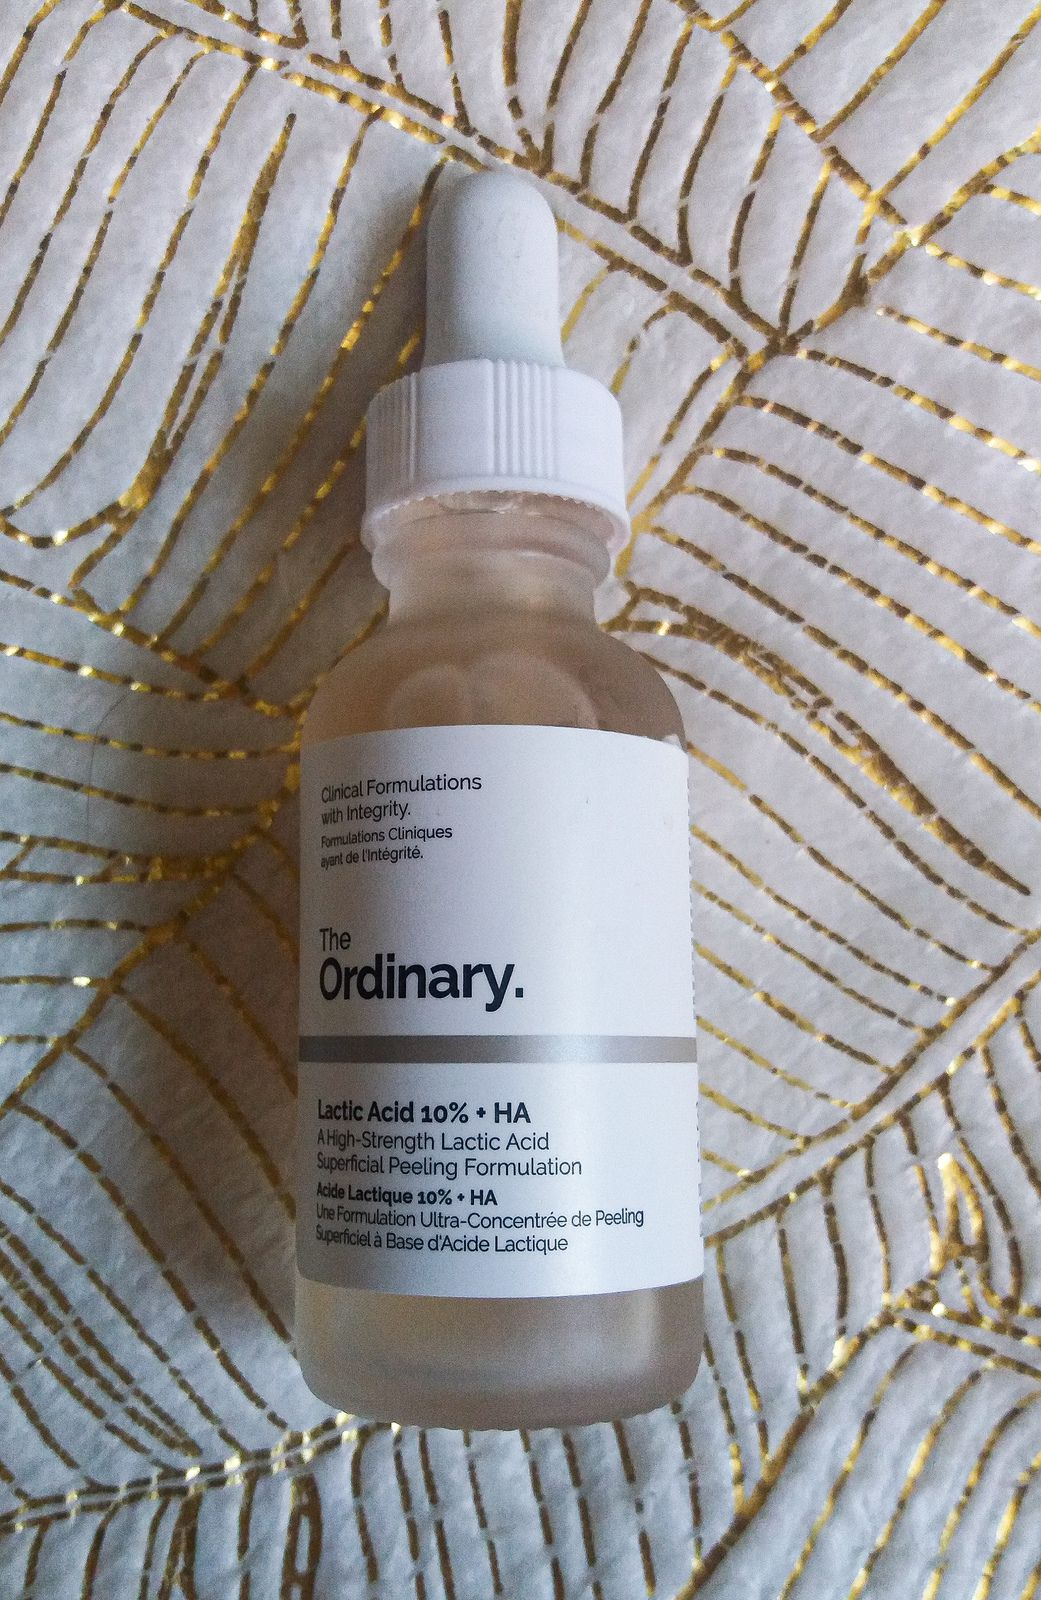 The Ordinary, Acide Lactique 10% + HA